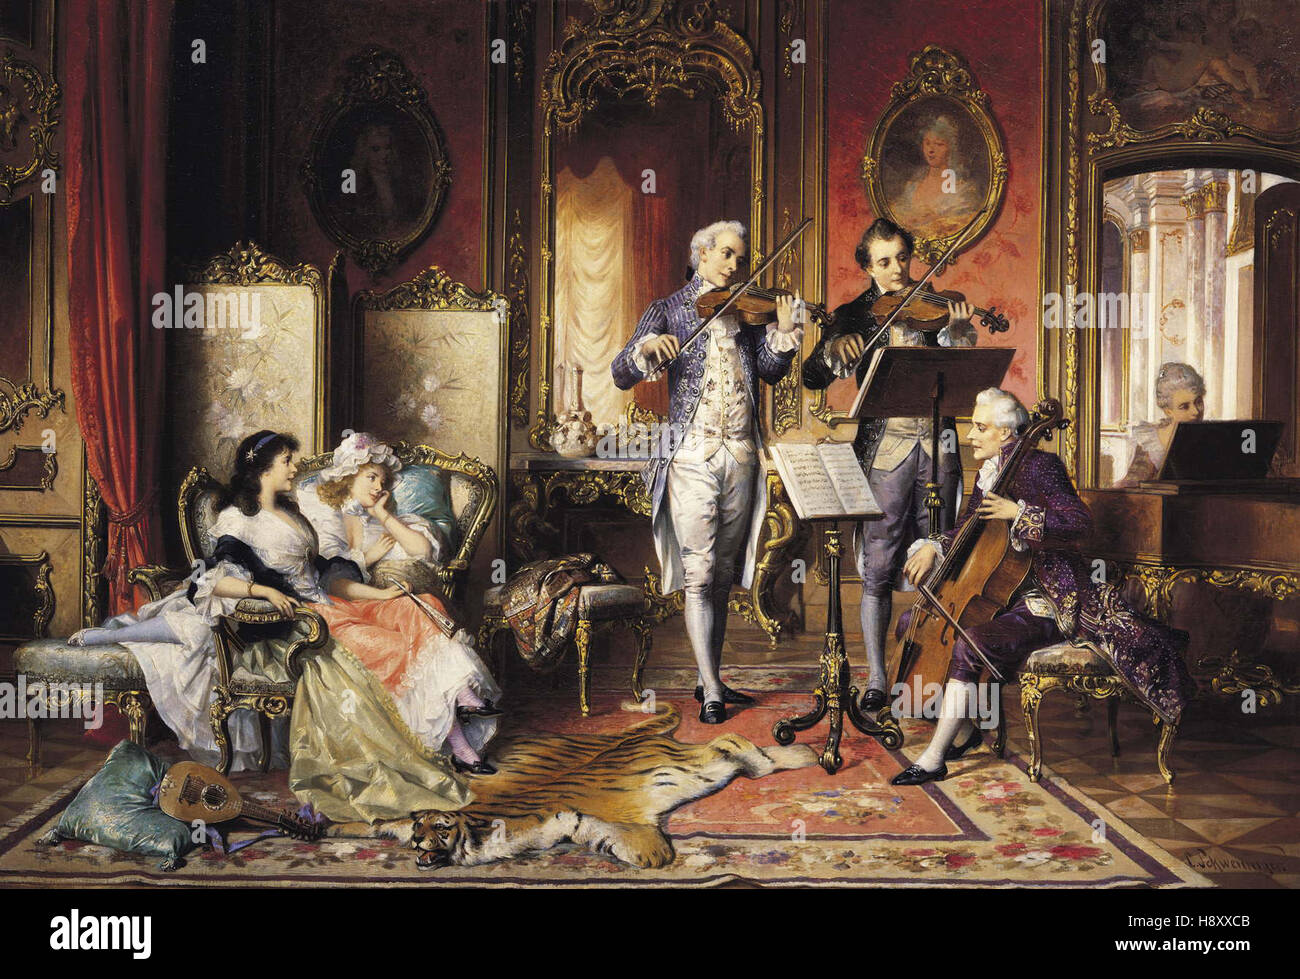 Karl Schweninger   A Musical Interlude - Stock Image